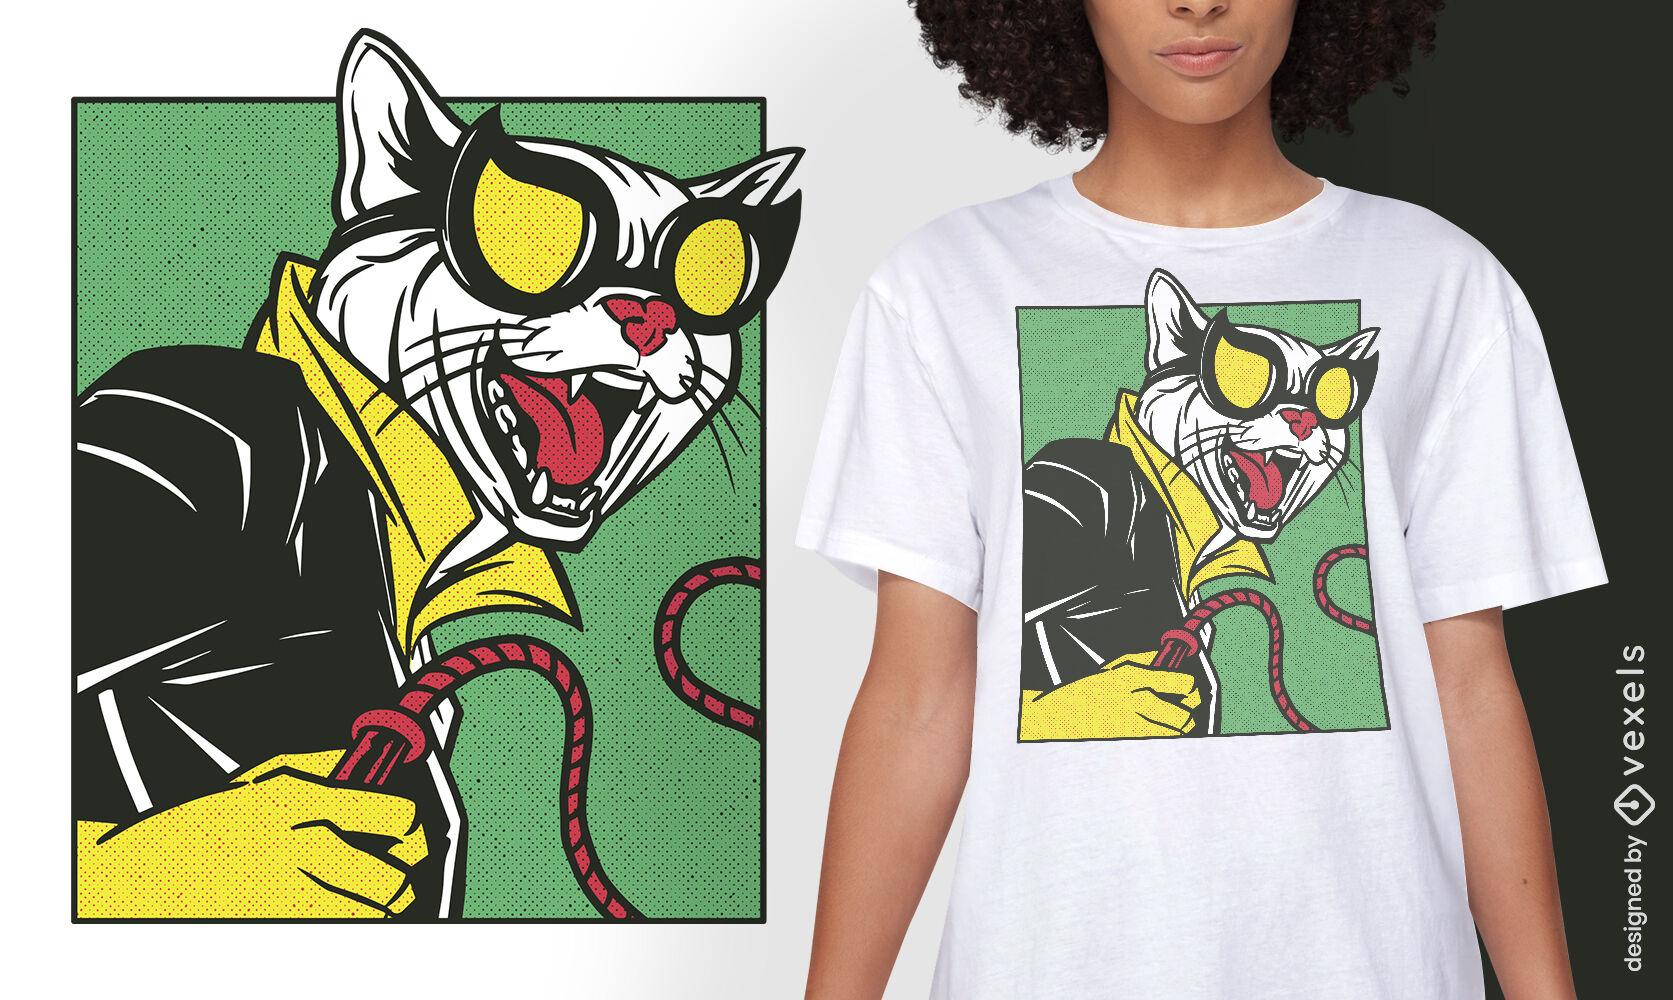 Cat woman parody t-shirt design